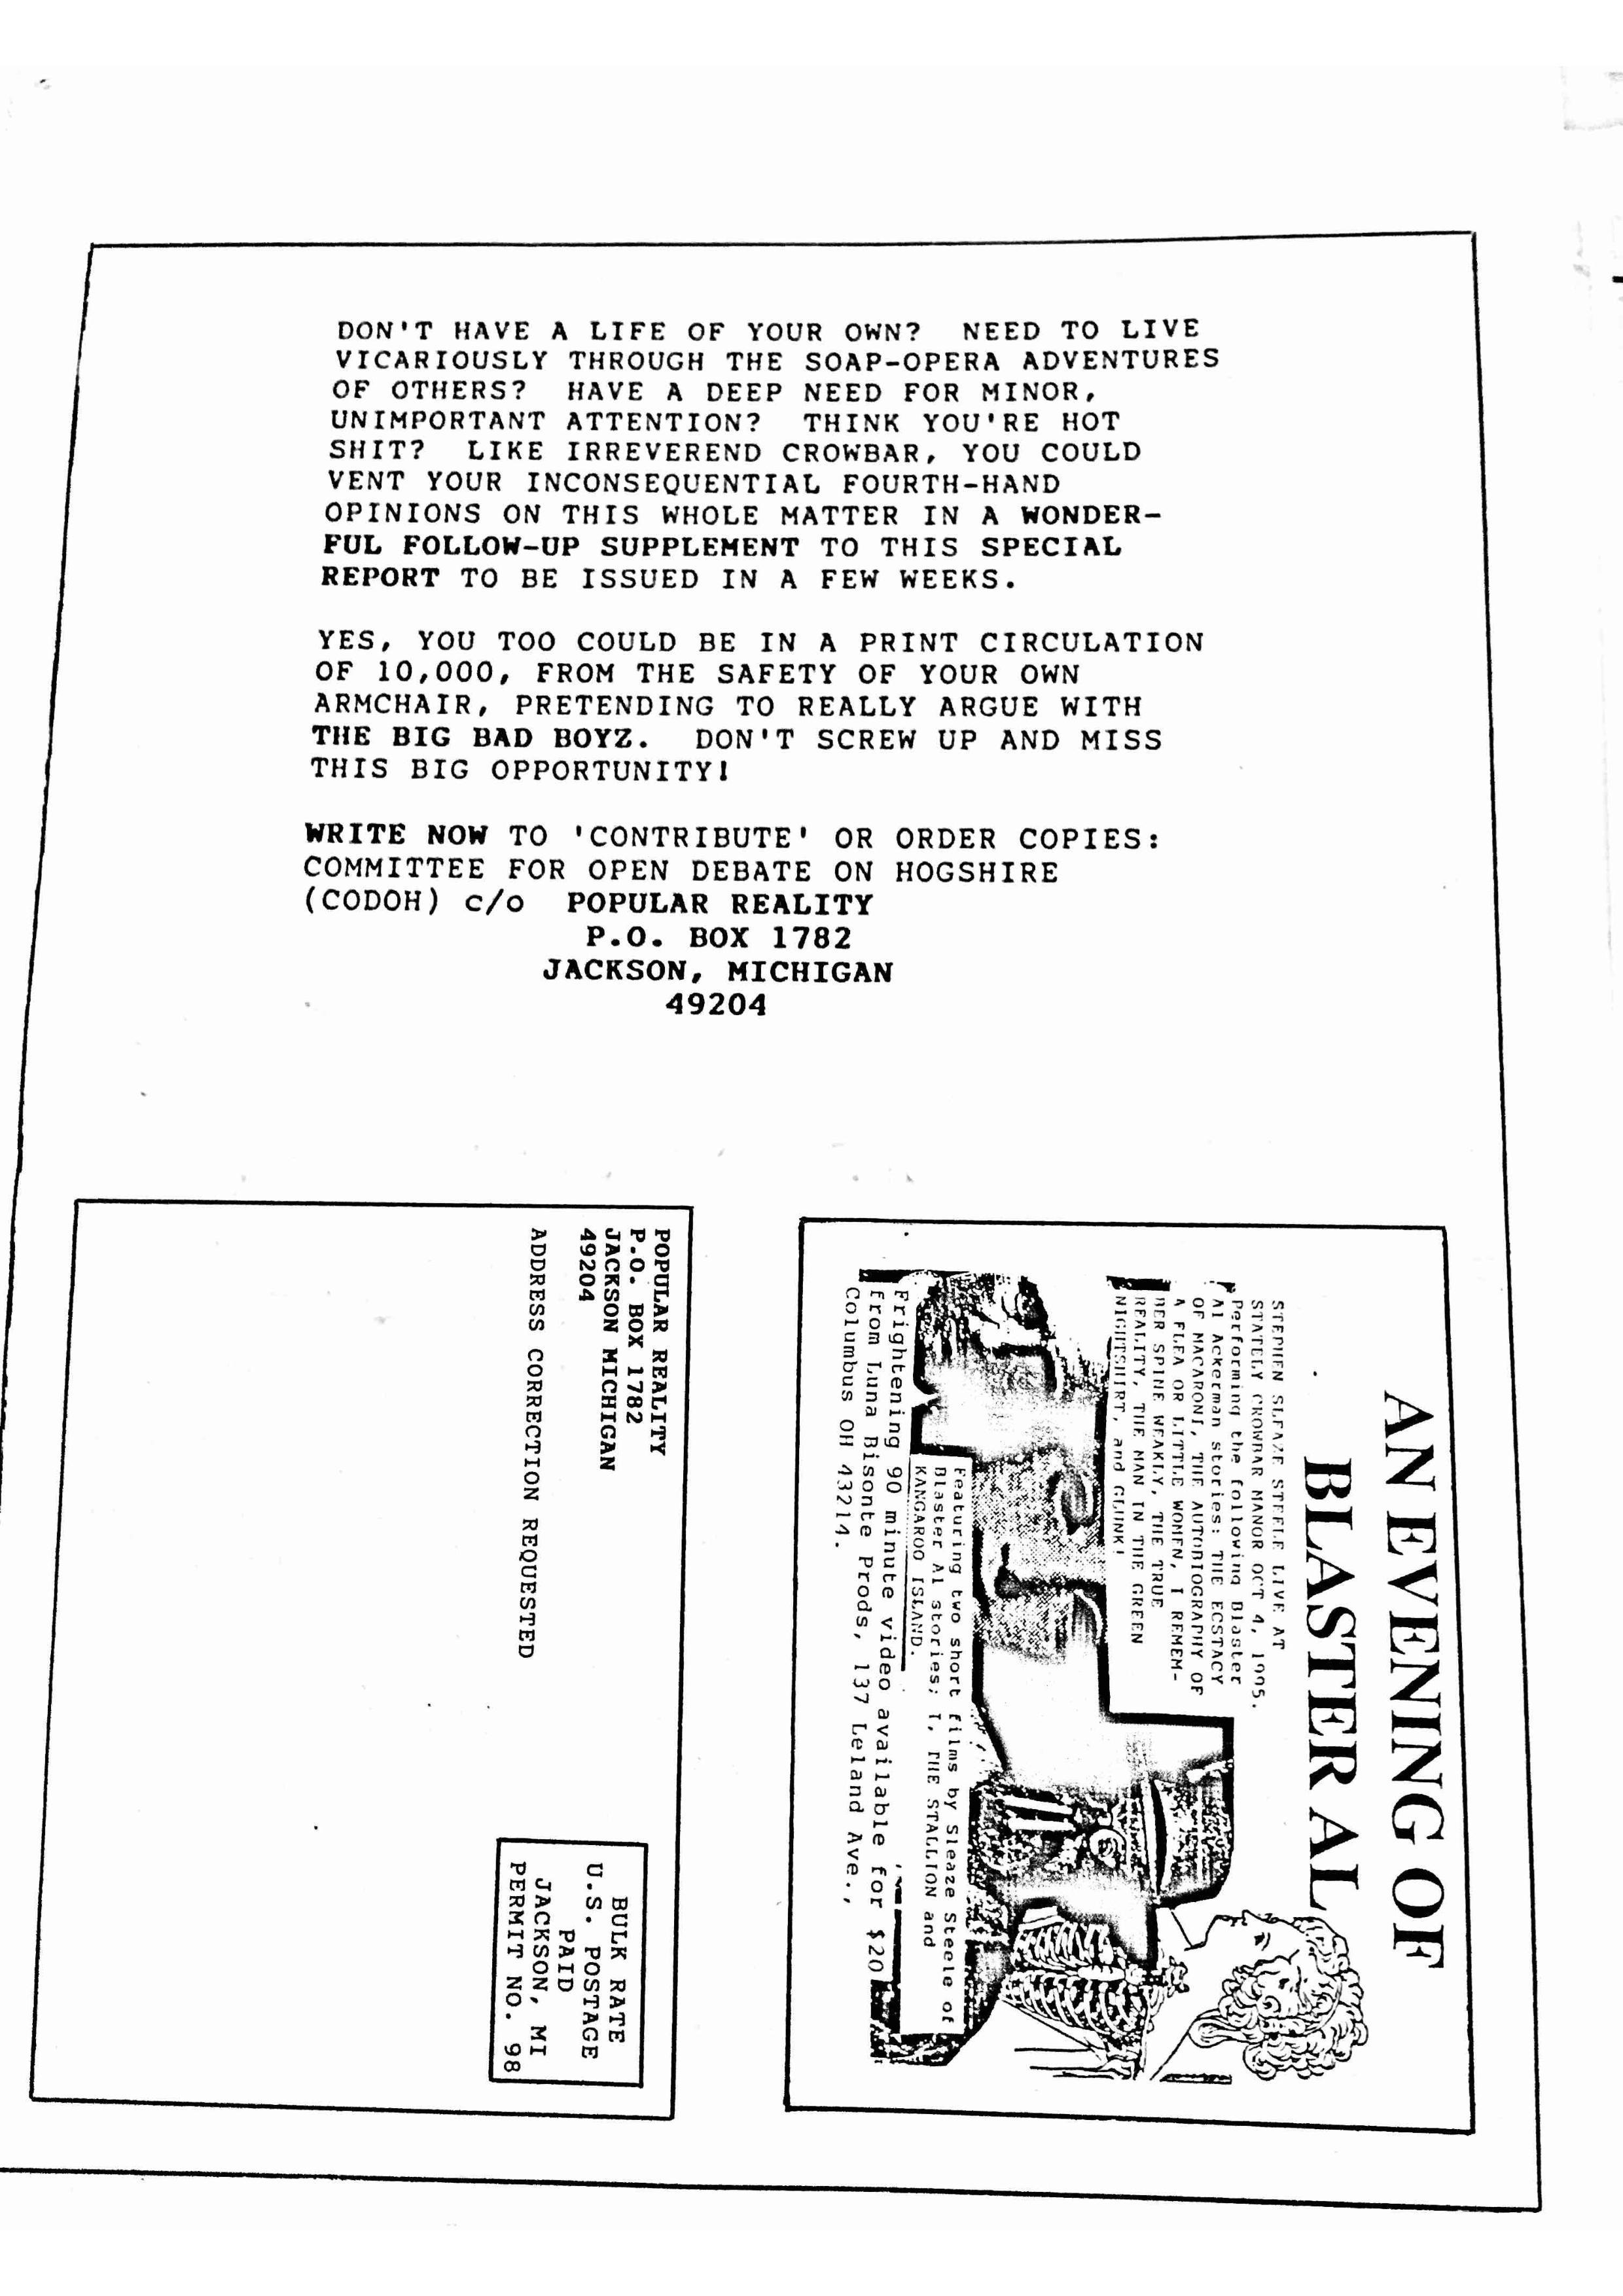 PopRealBlack-page-013.jpg